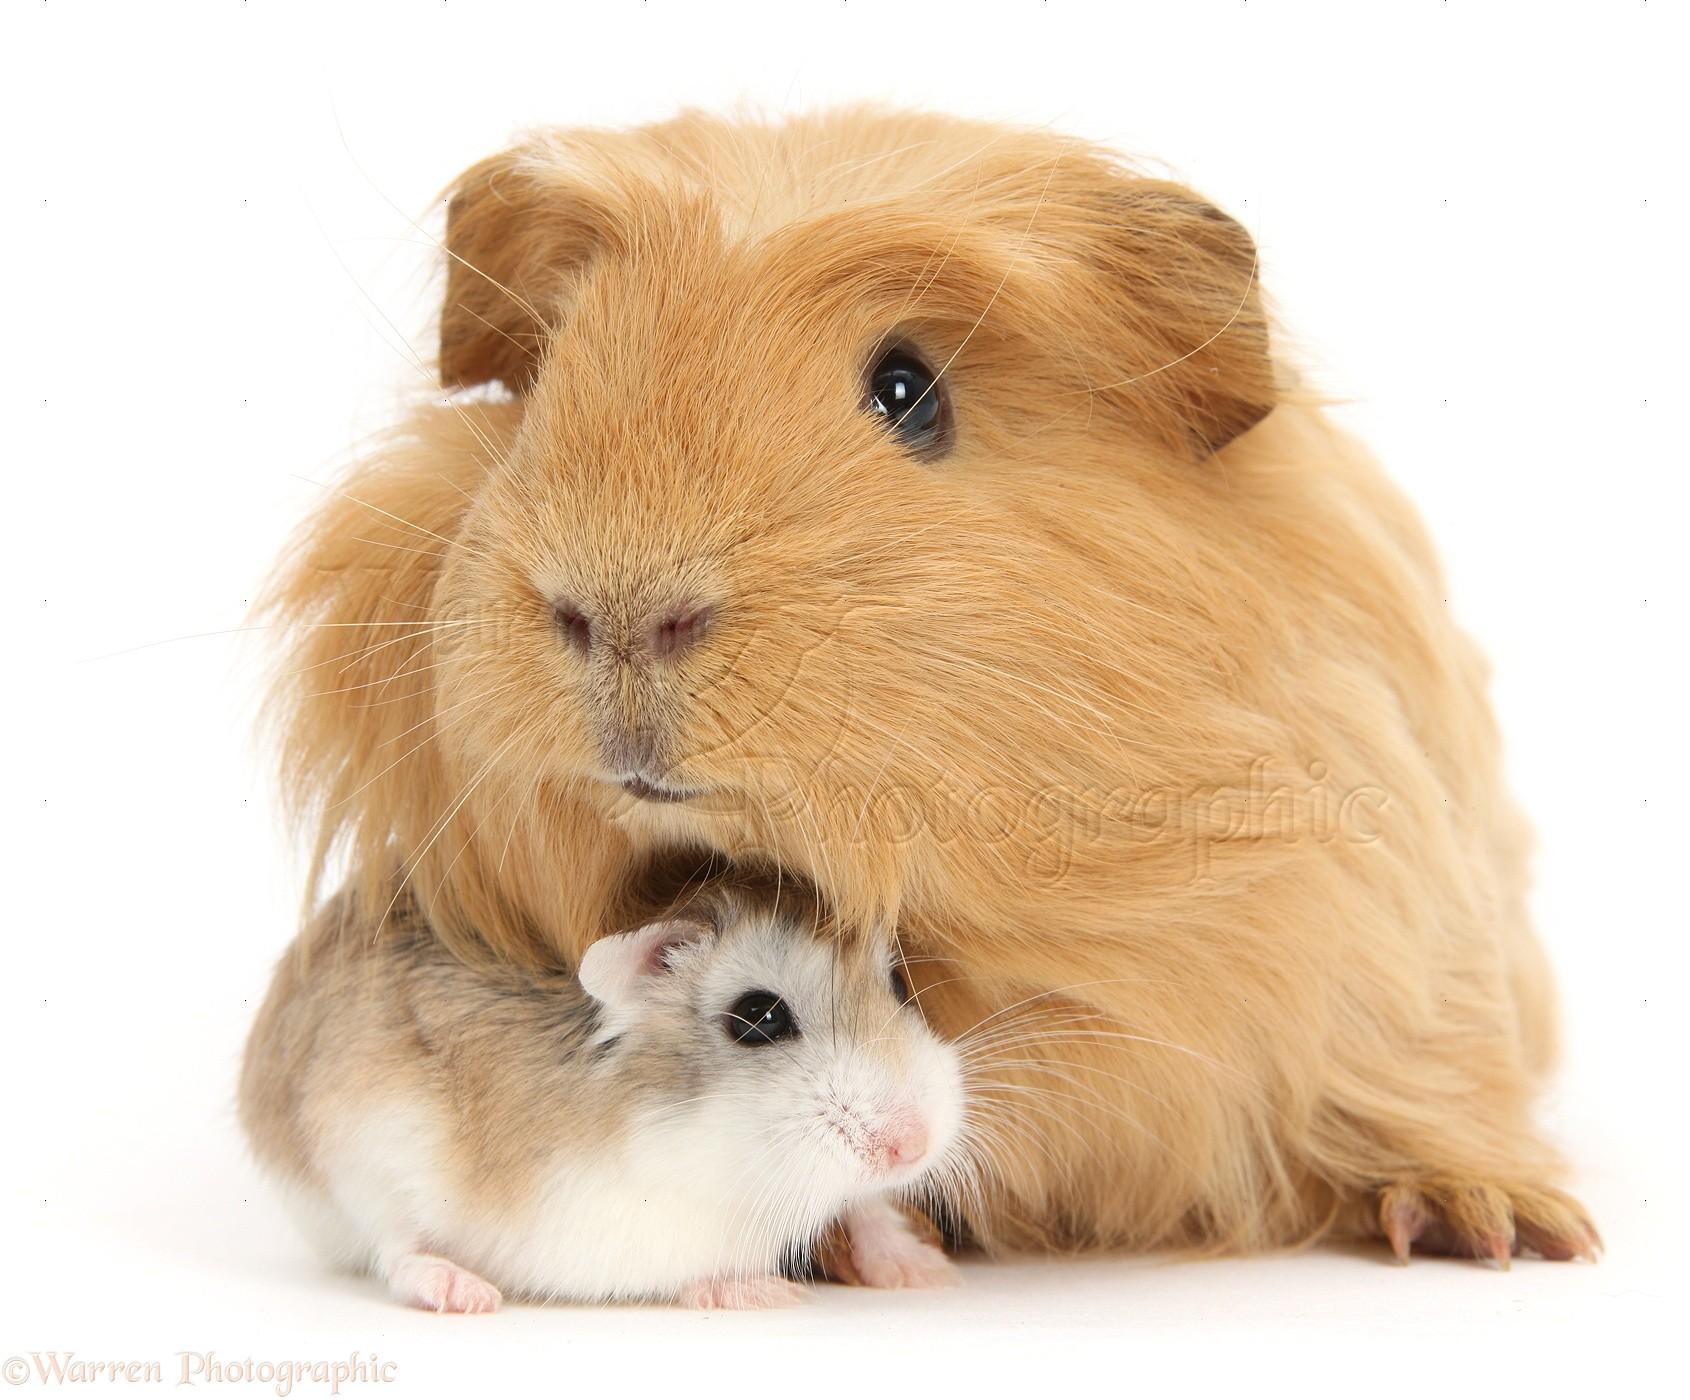 Uncategorized Hamster And Guinea Pig ginger guinea pig and roborovski hamster photo wp39332 puppy red pig